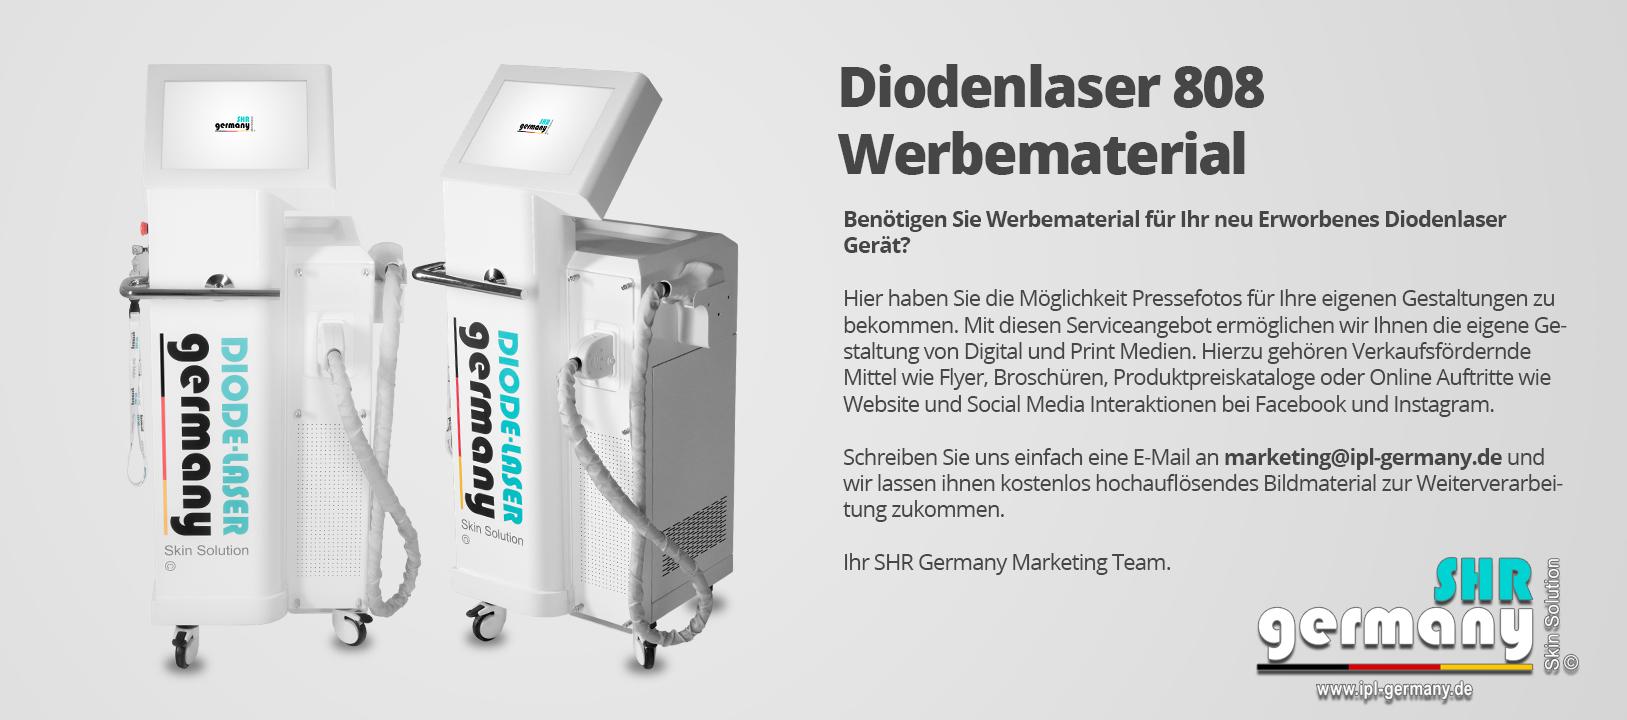 SHR_Germany_Diodenlaser_808_Werbematerial